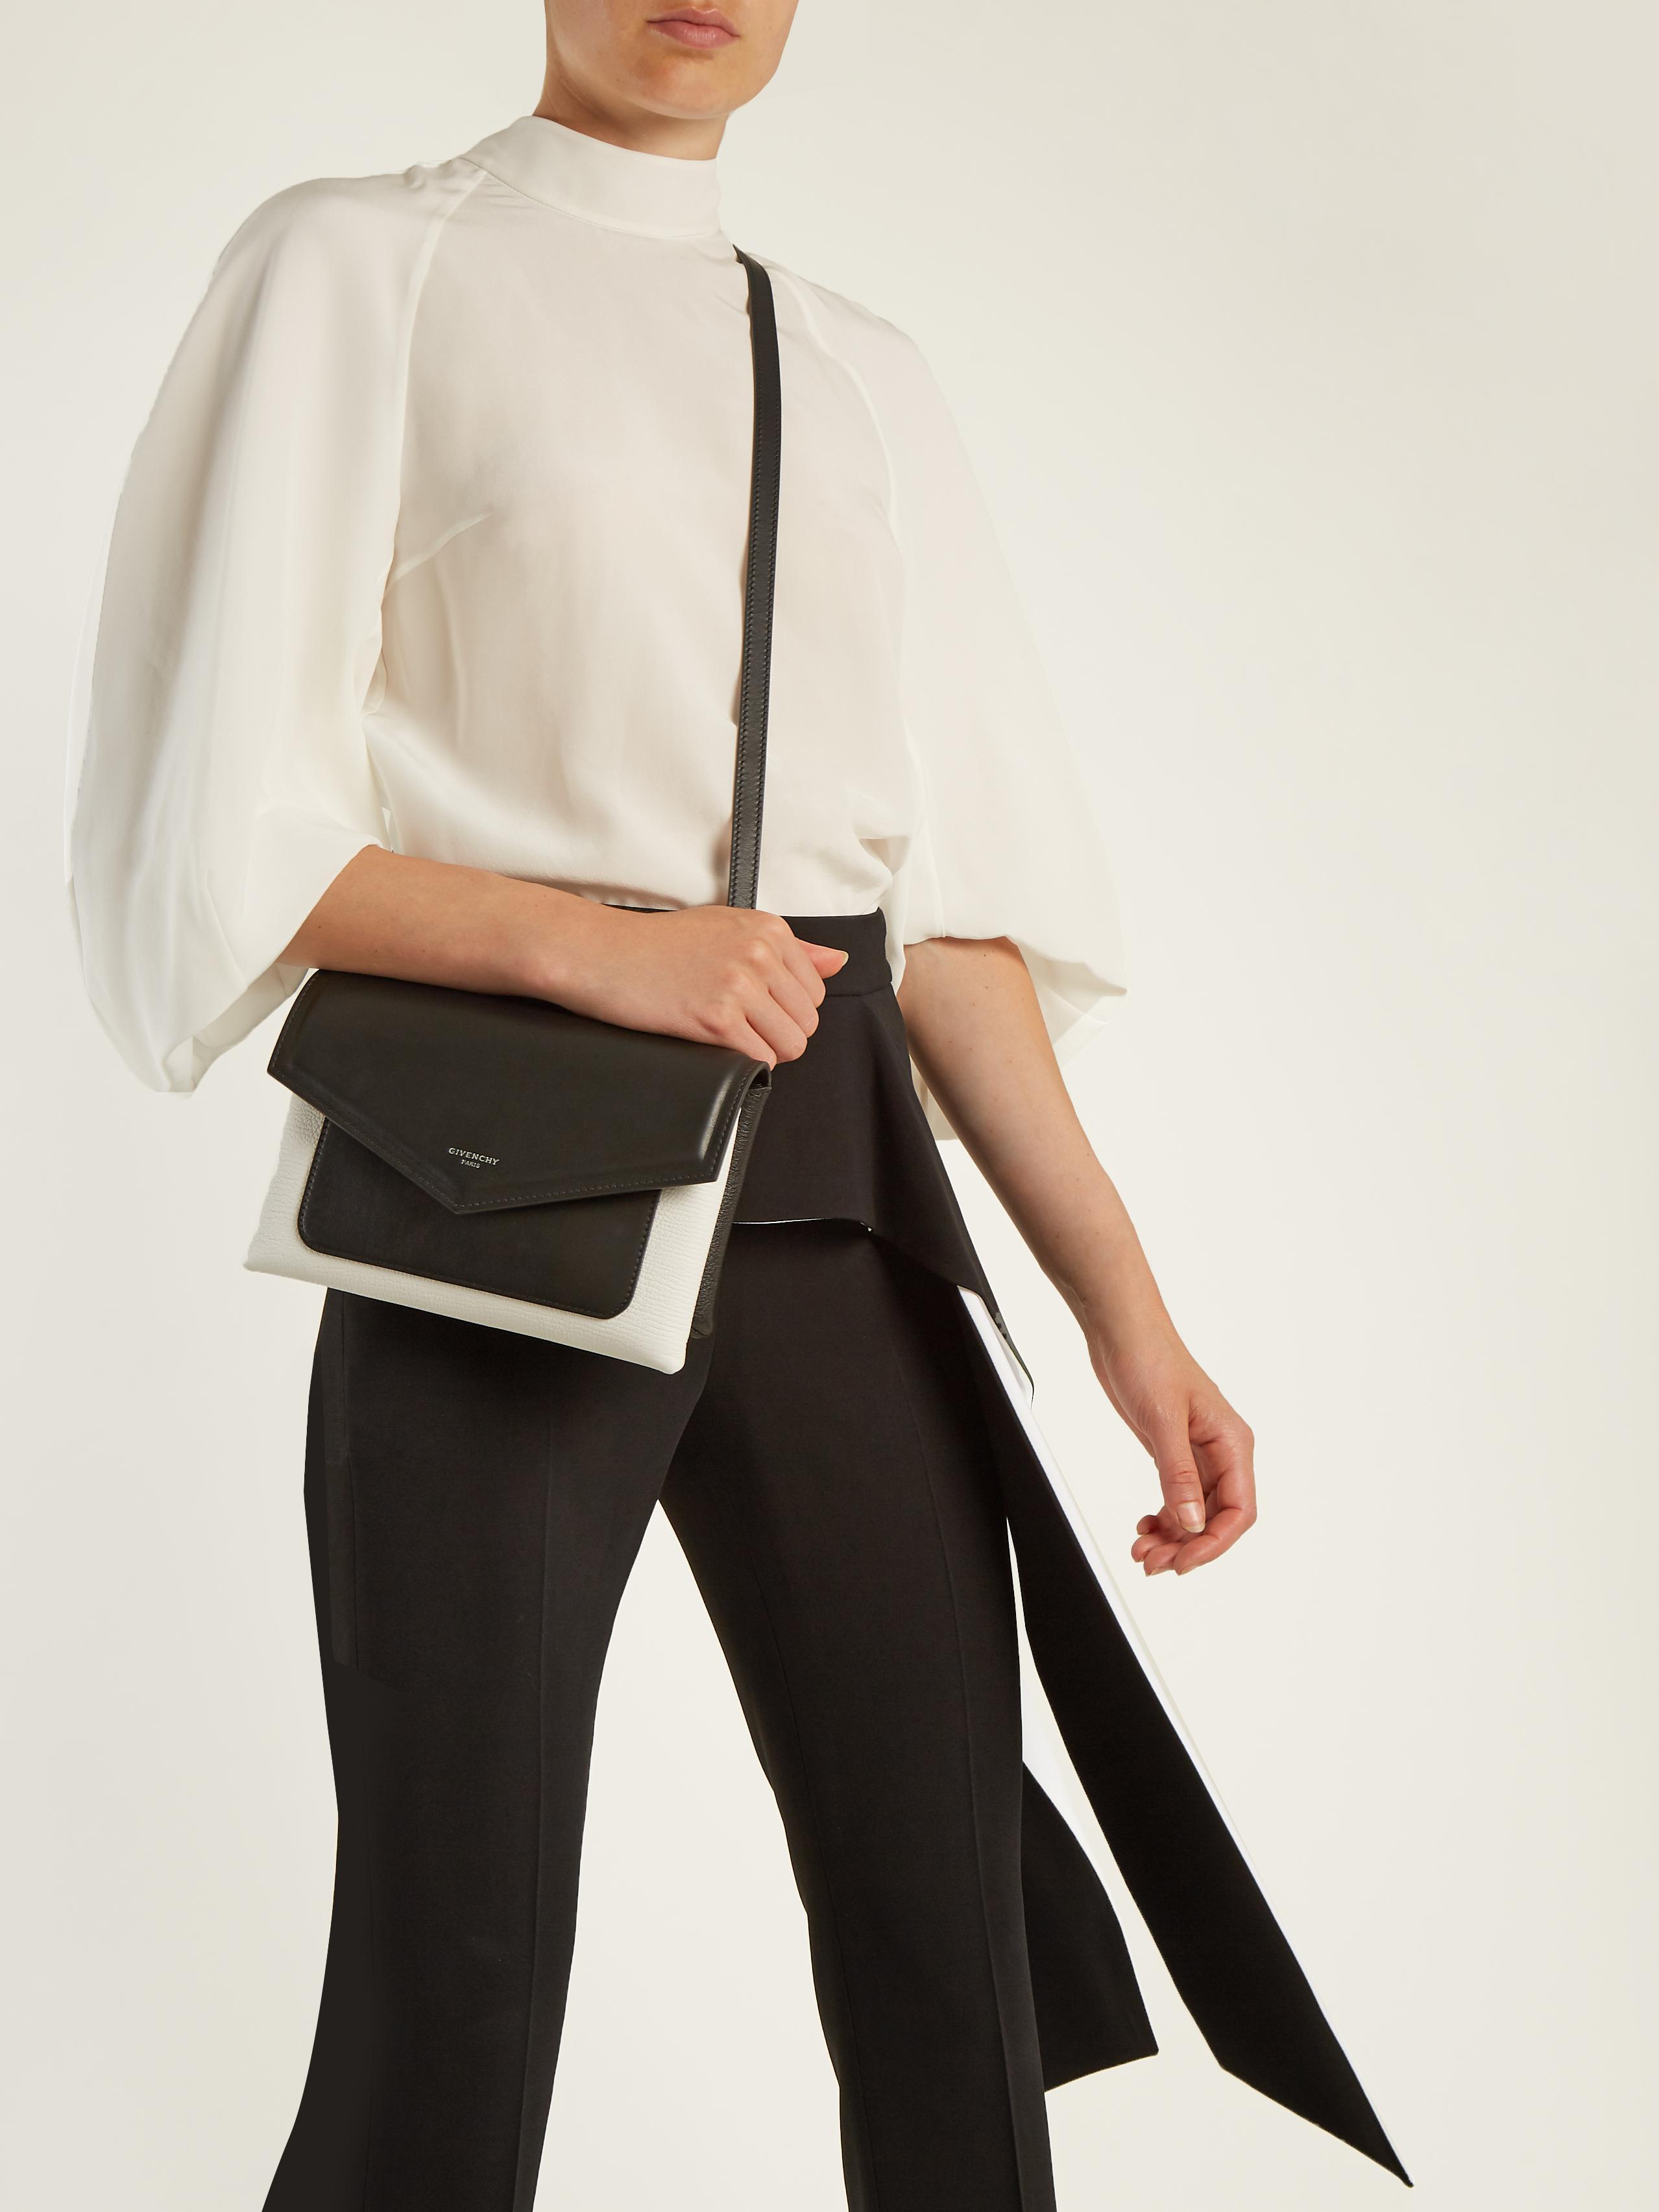 Duetto cross-body bag - Black Givenchy BsIH4XGtR